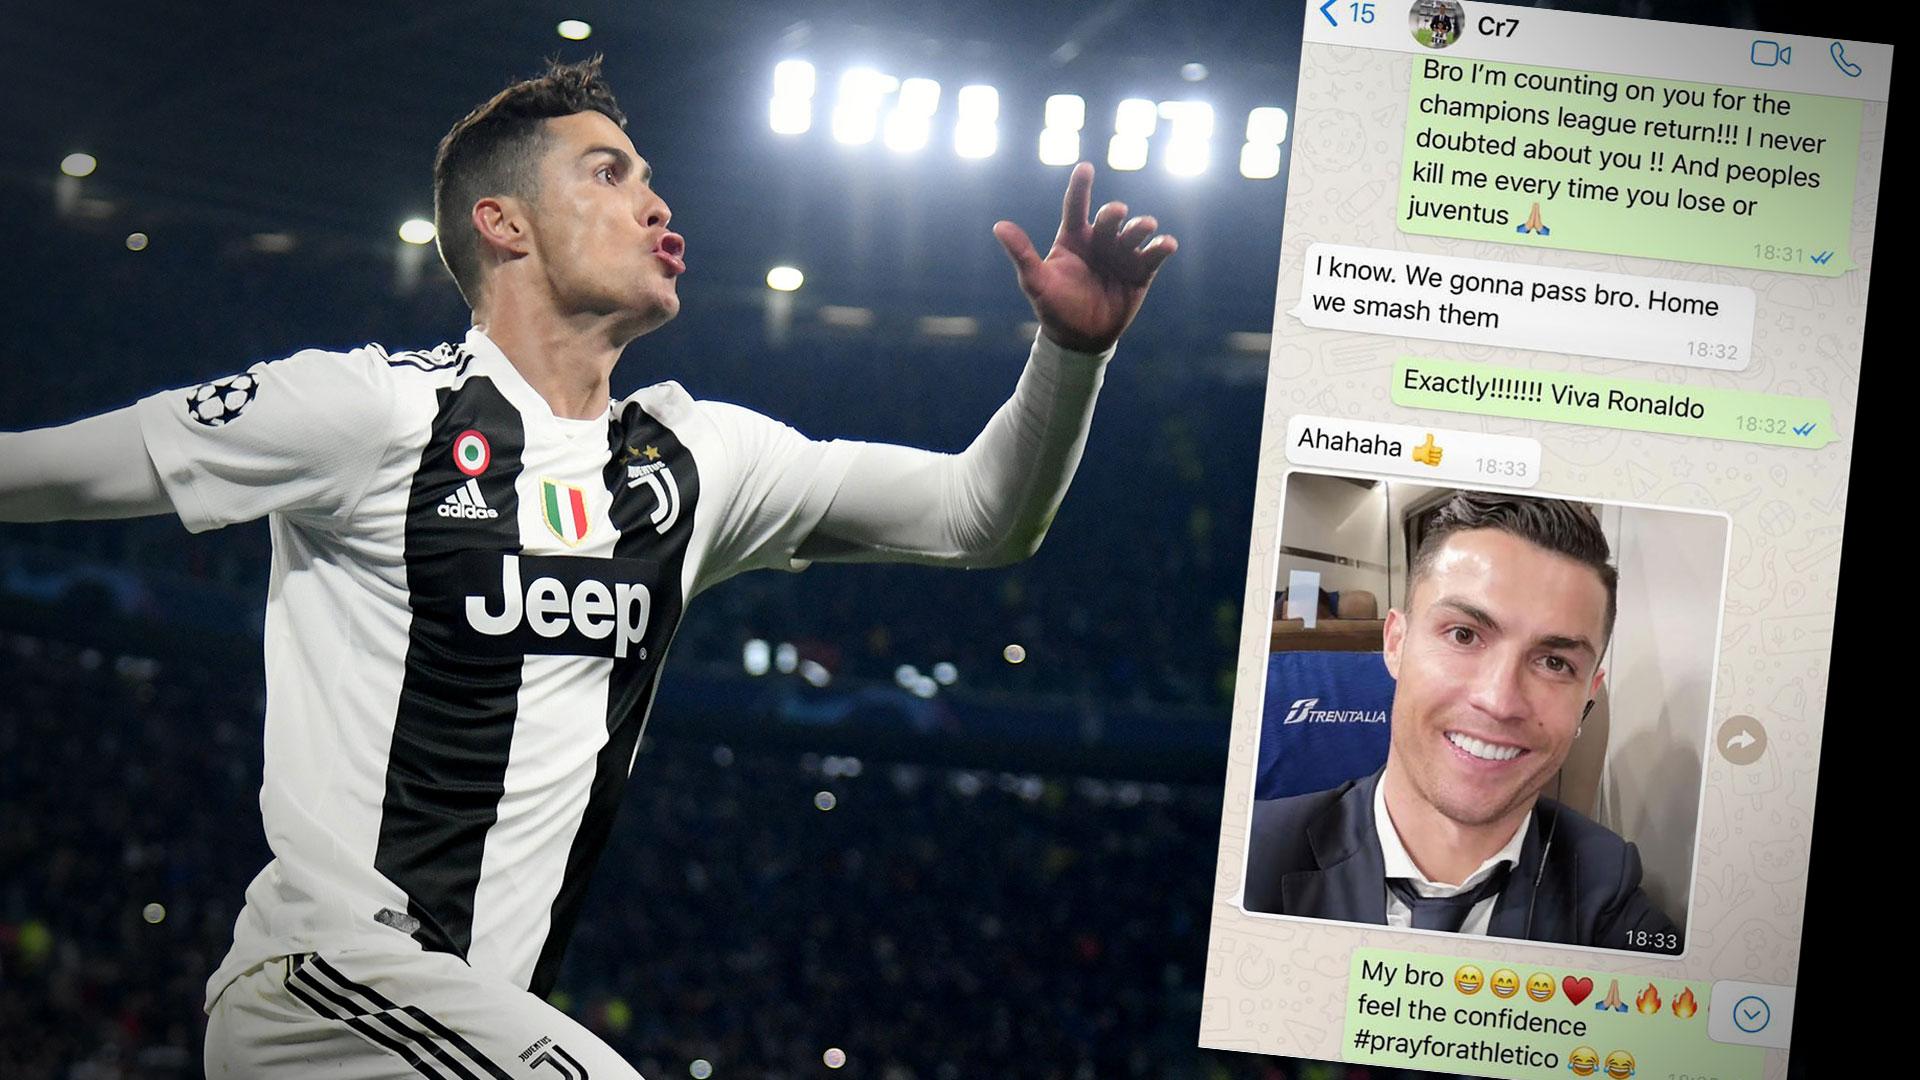 Ronaldo le anticipó a Evra por WhatsApp que iba a aplastar al Atlético en Turín